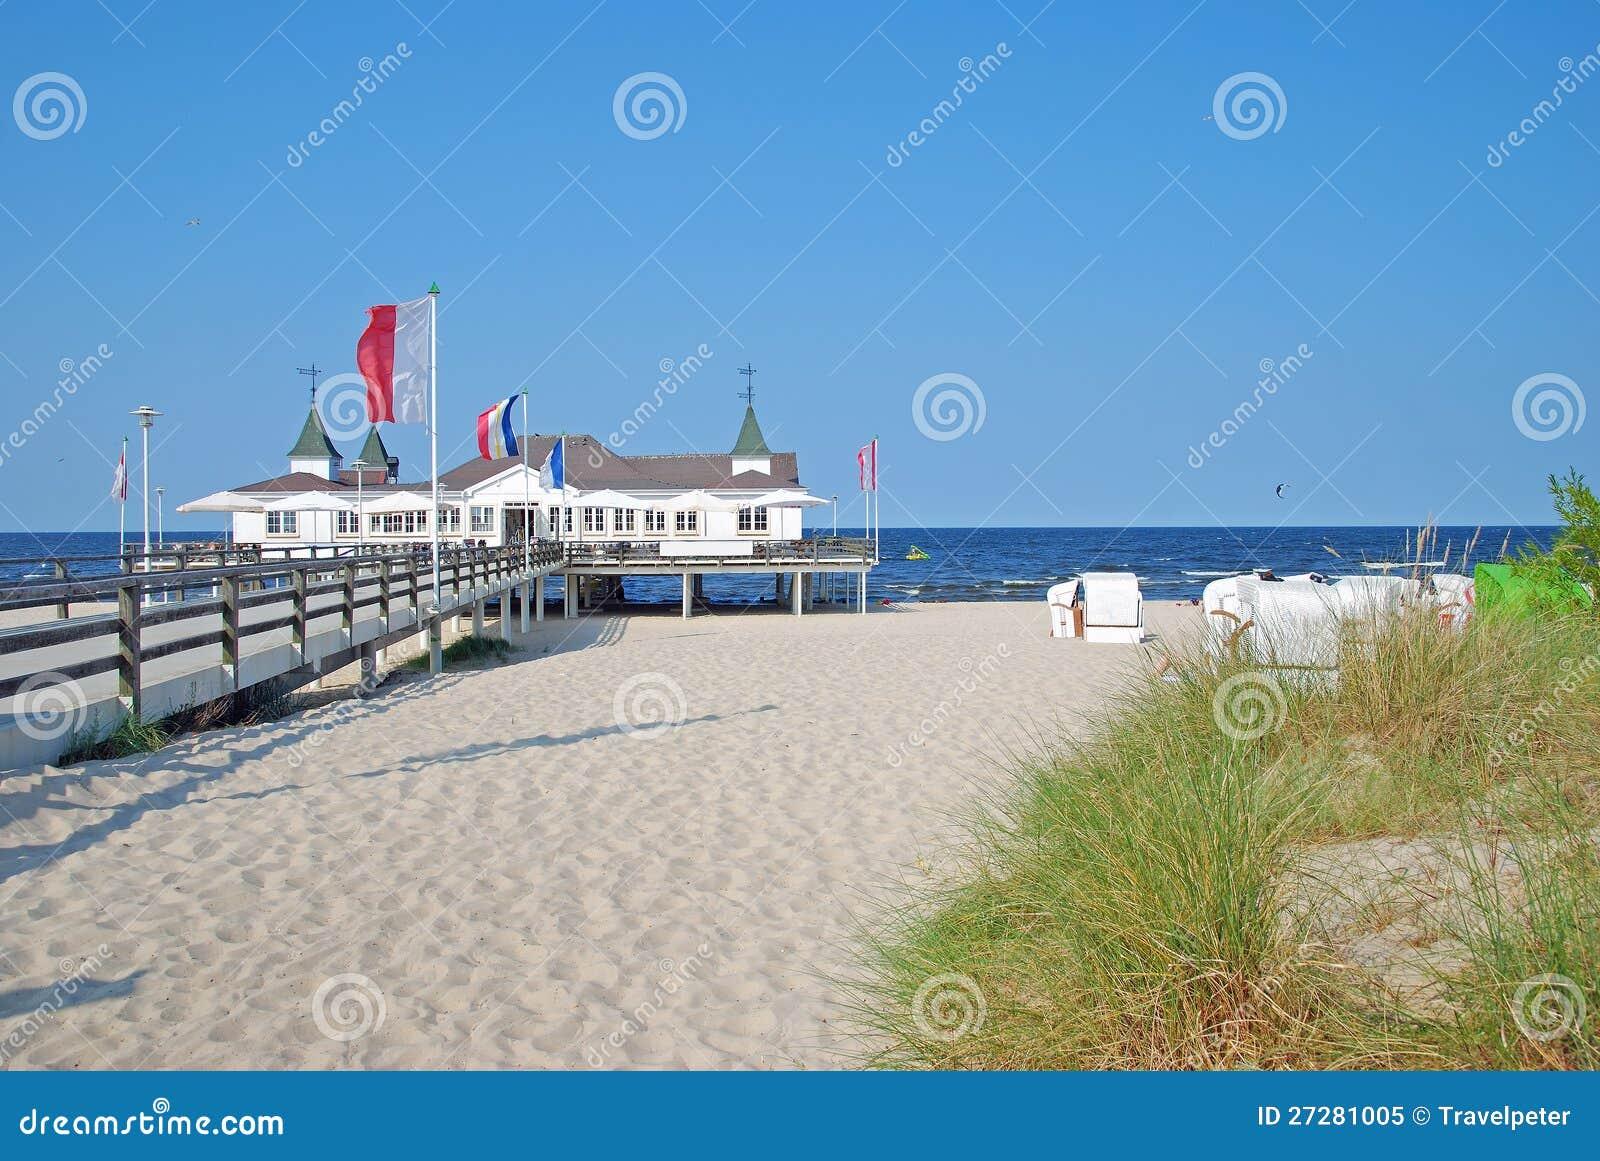 Ahlbeck, usedomeiland, Oostzee, Duitsland